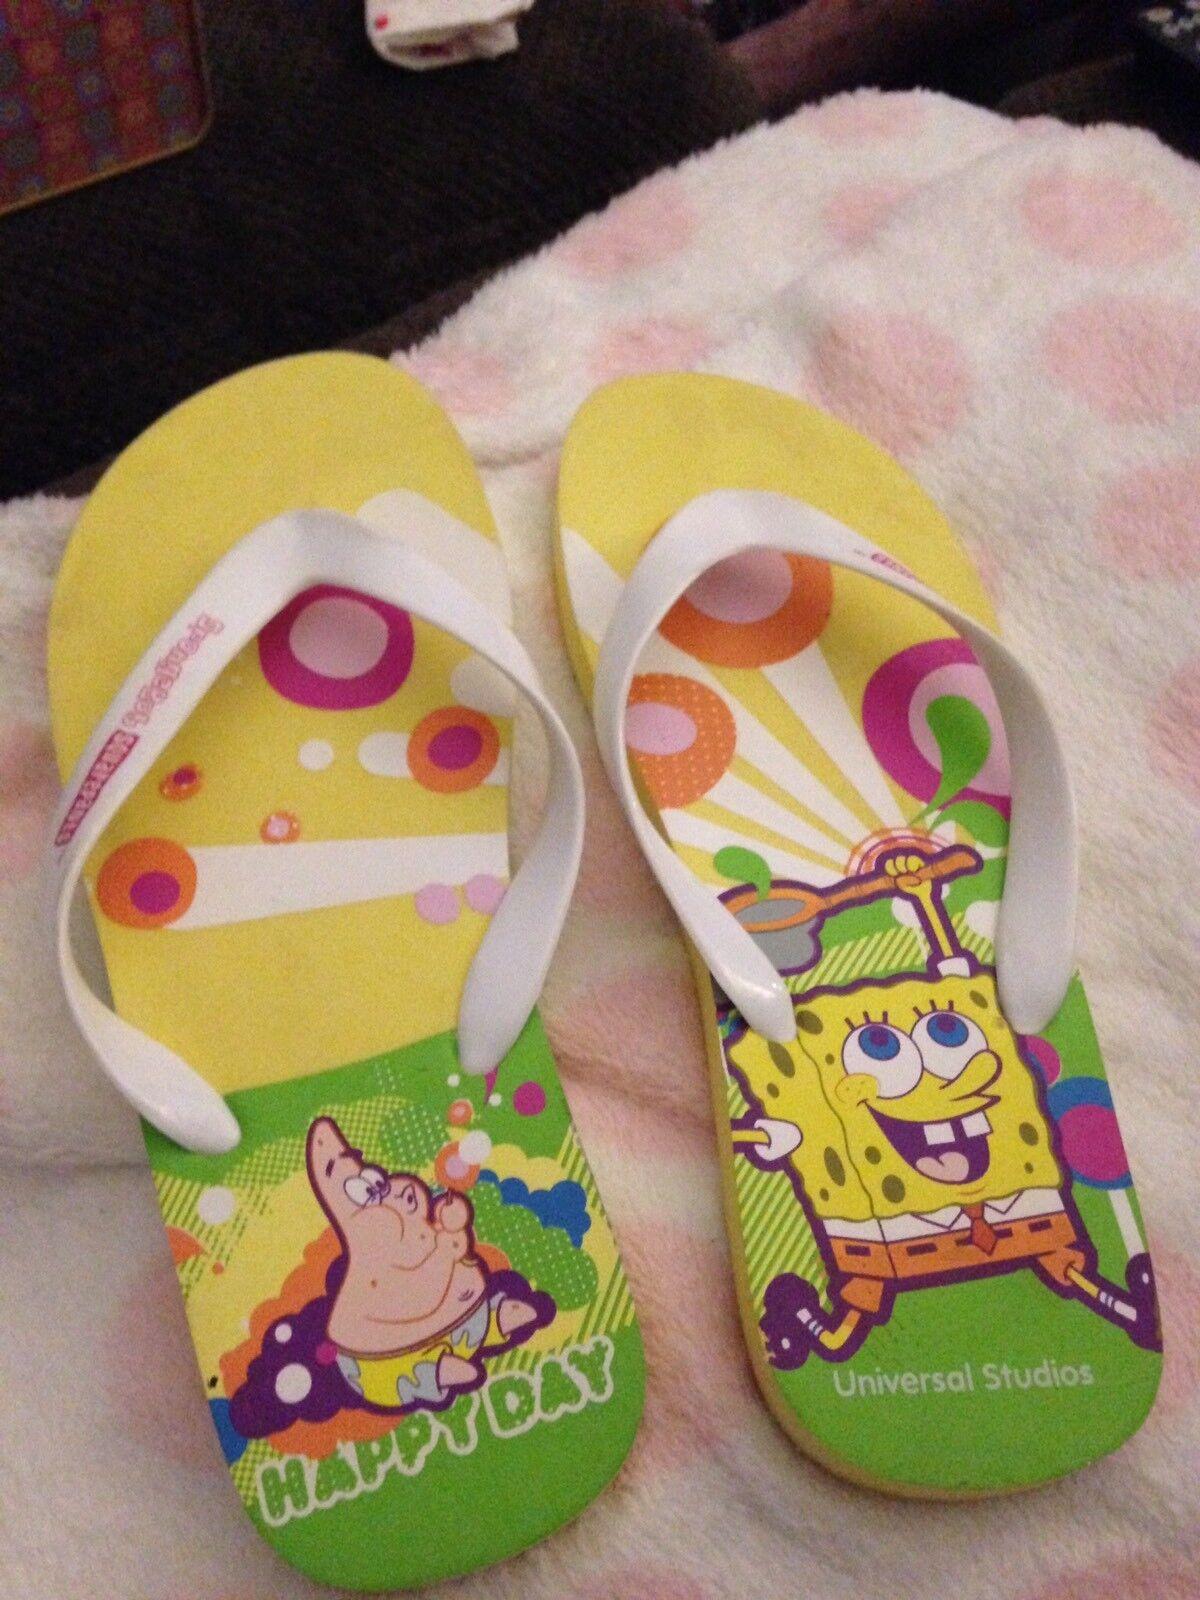 Universal Studios Sponge Bob Square 10 Panta Flip Flops Size 10 Square 014898